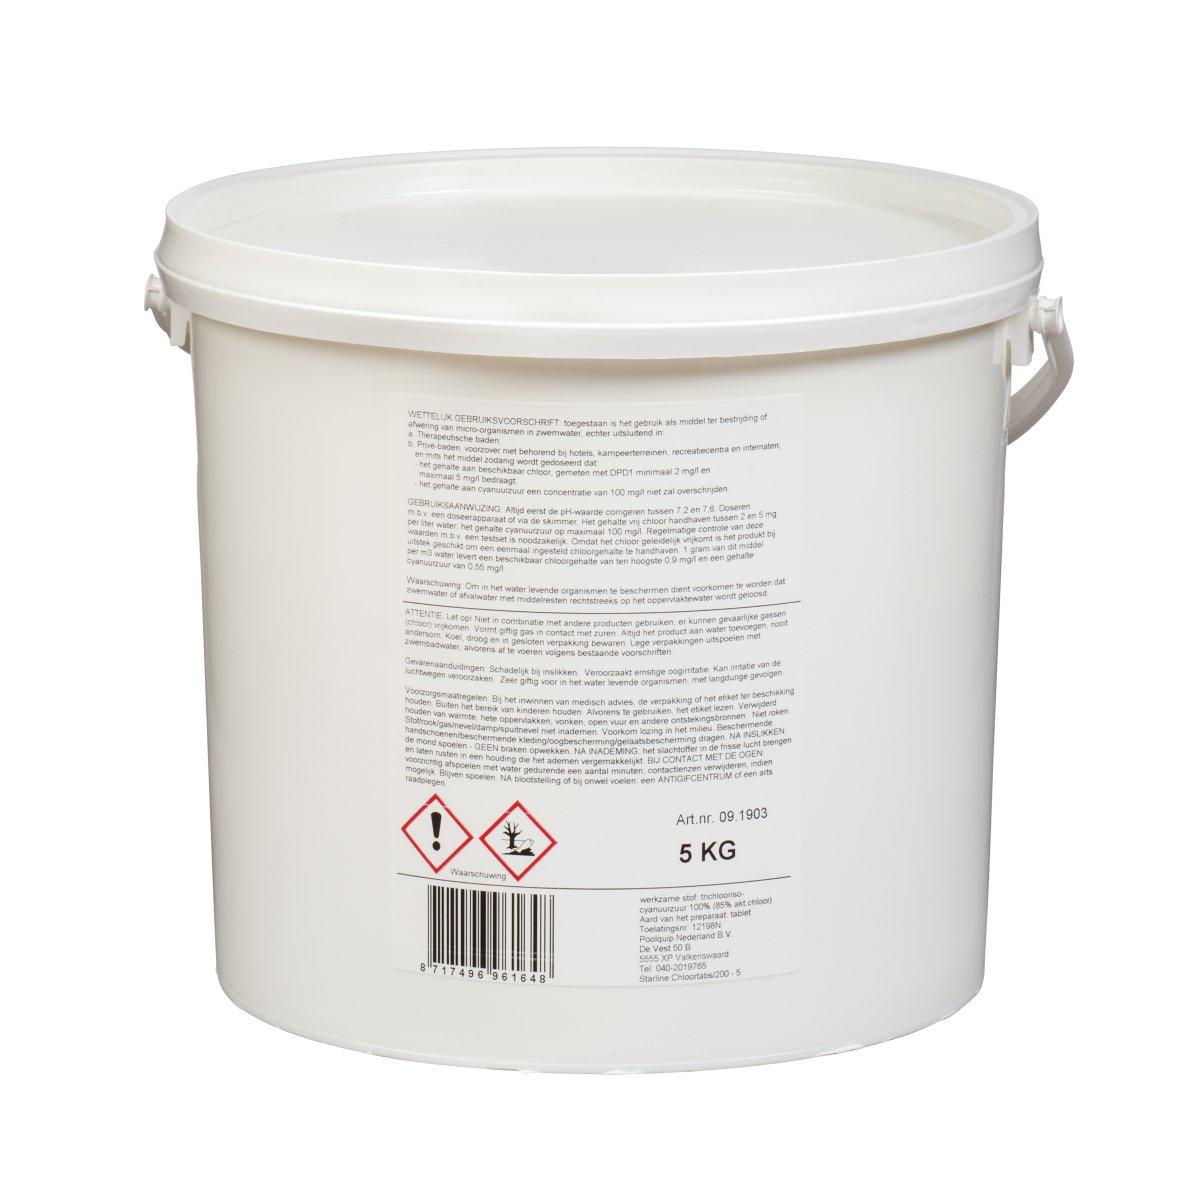 Starline Chloortabs 90/200gr - 5kg